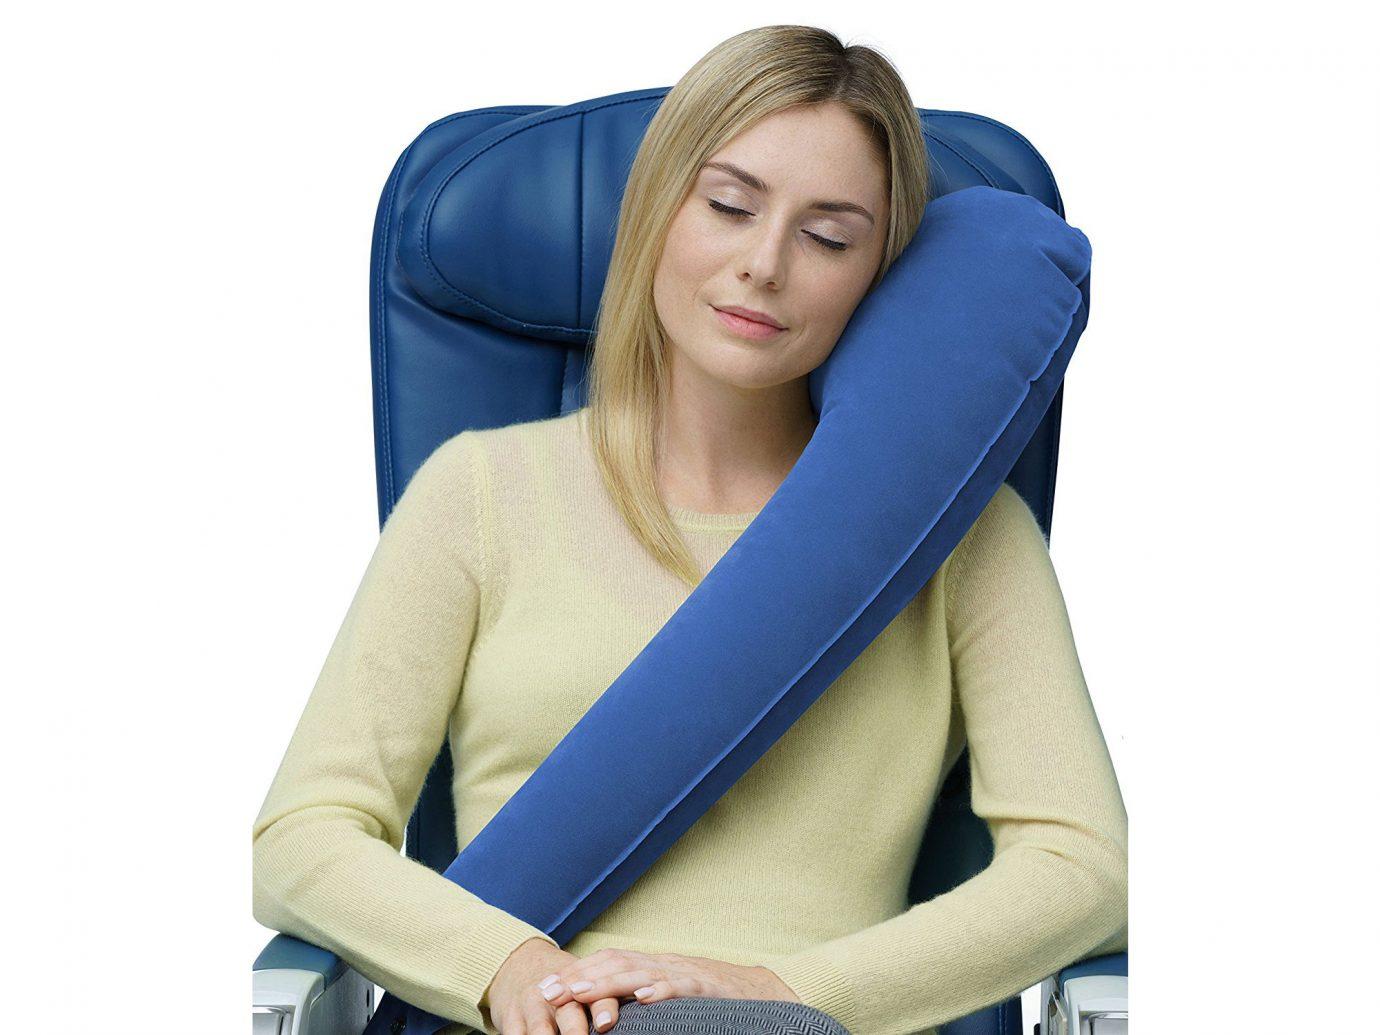 Woman resting against Blue Travelrest Ultimate Travel Pillow